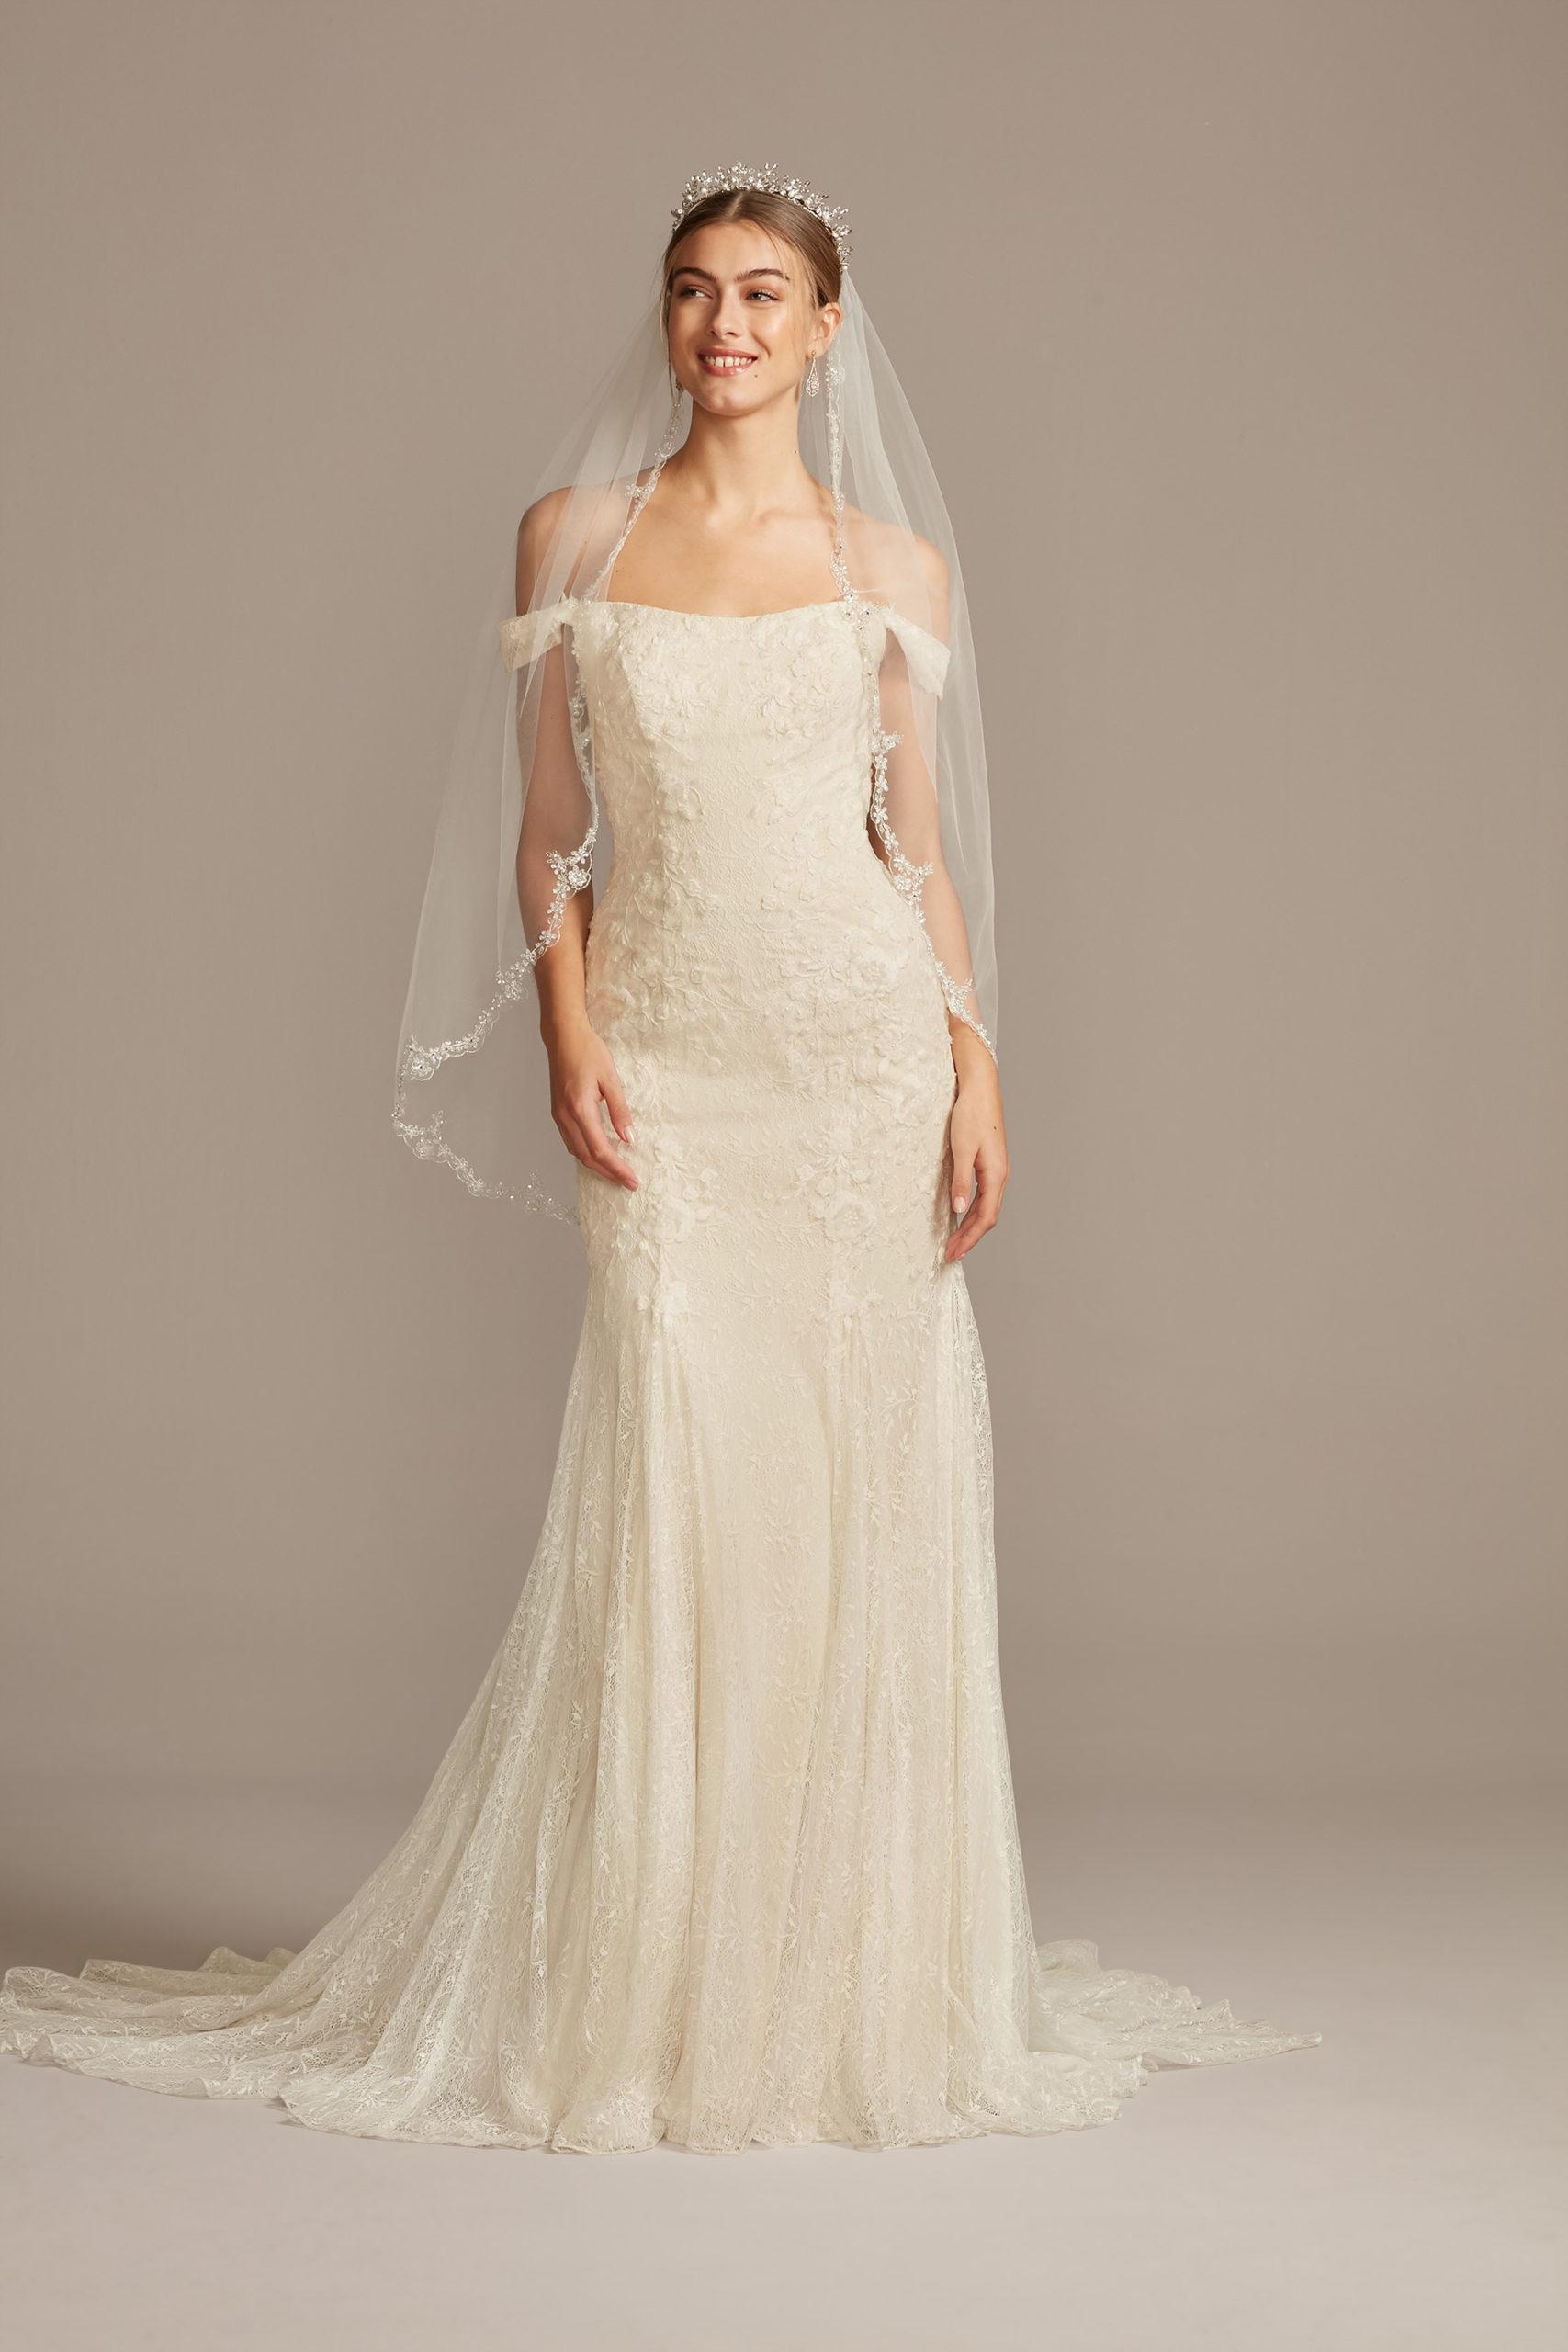 bride wearing wedding dress with swag sleeves